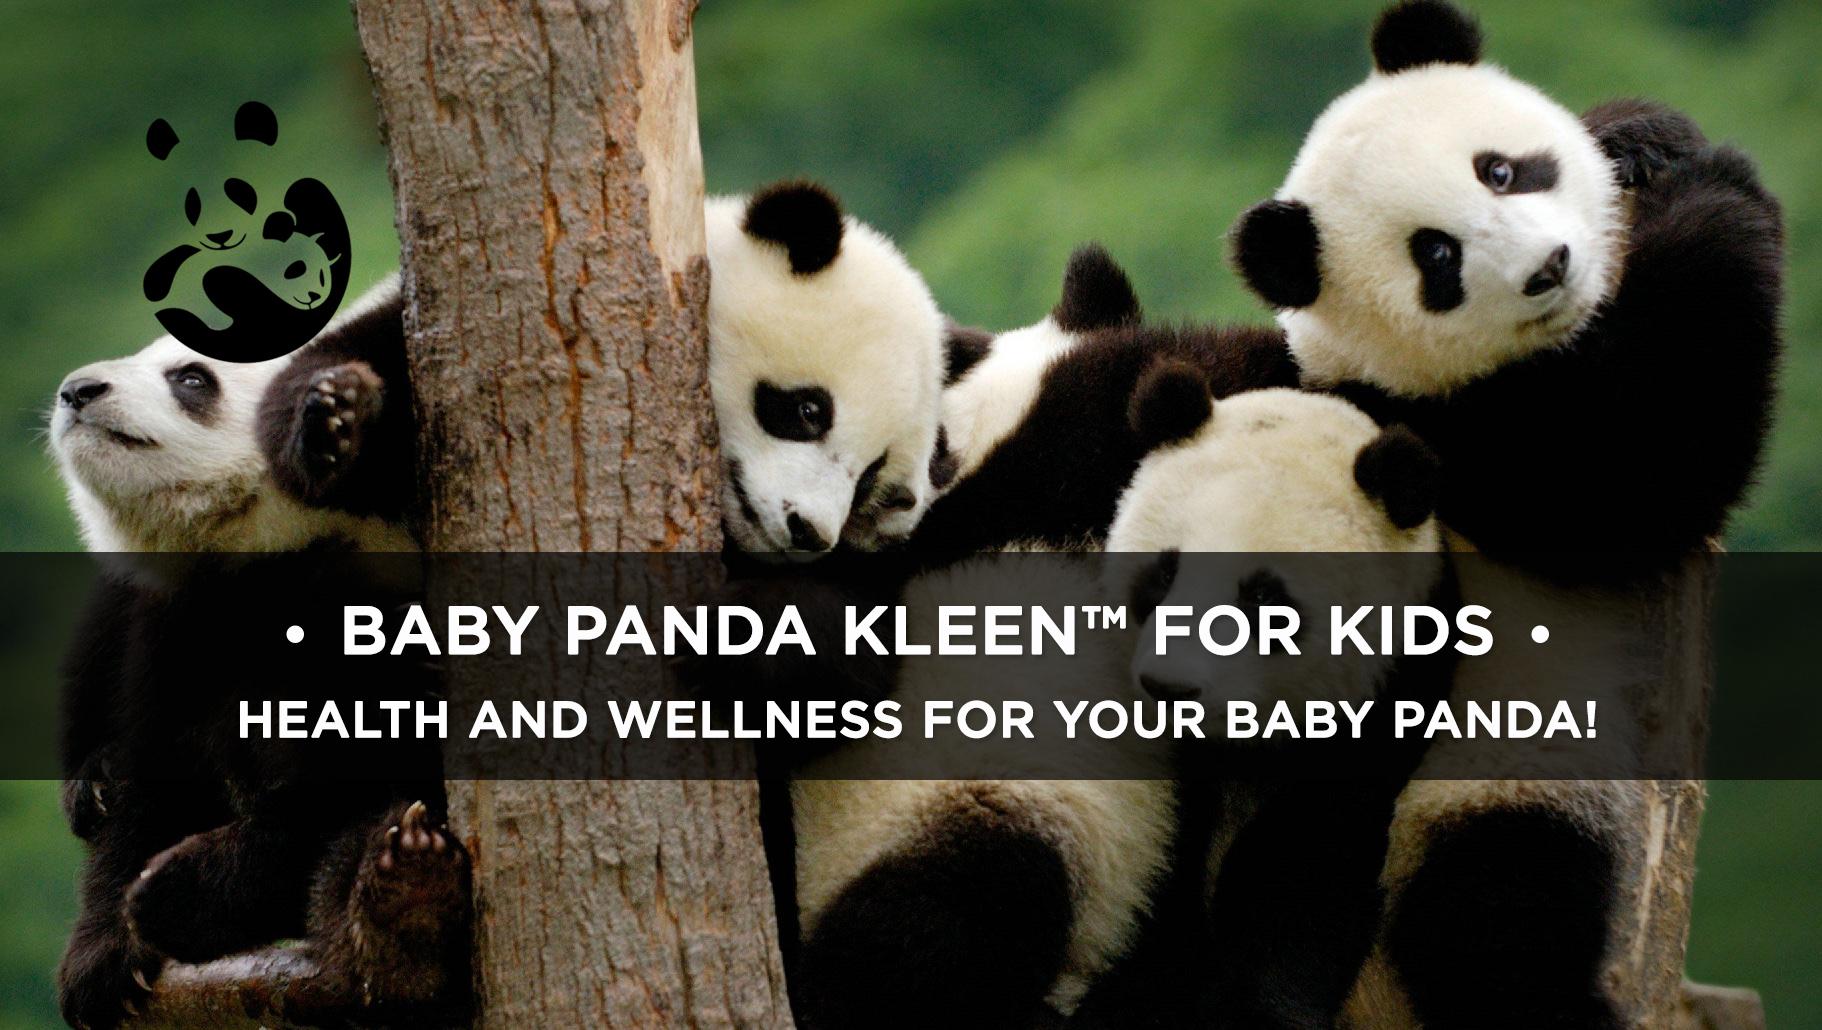 BABY PANDA KLEEN™